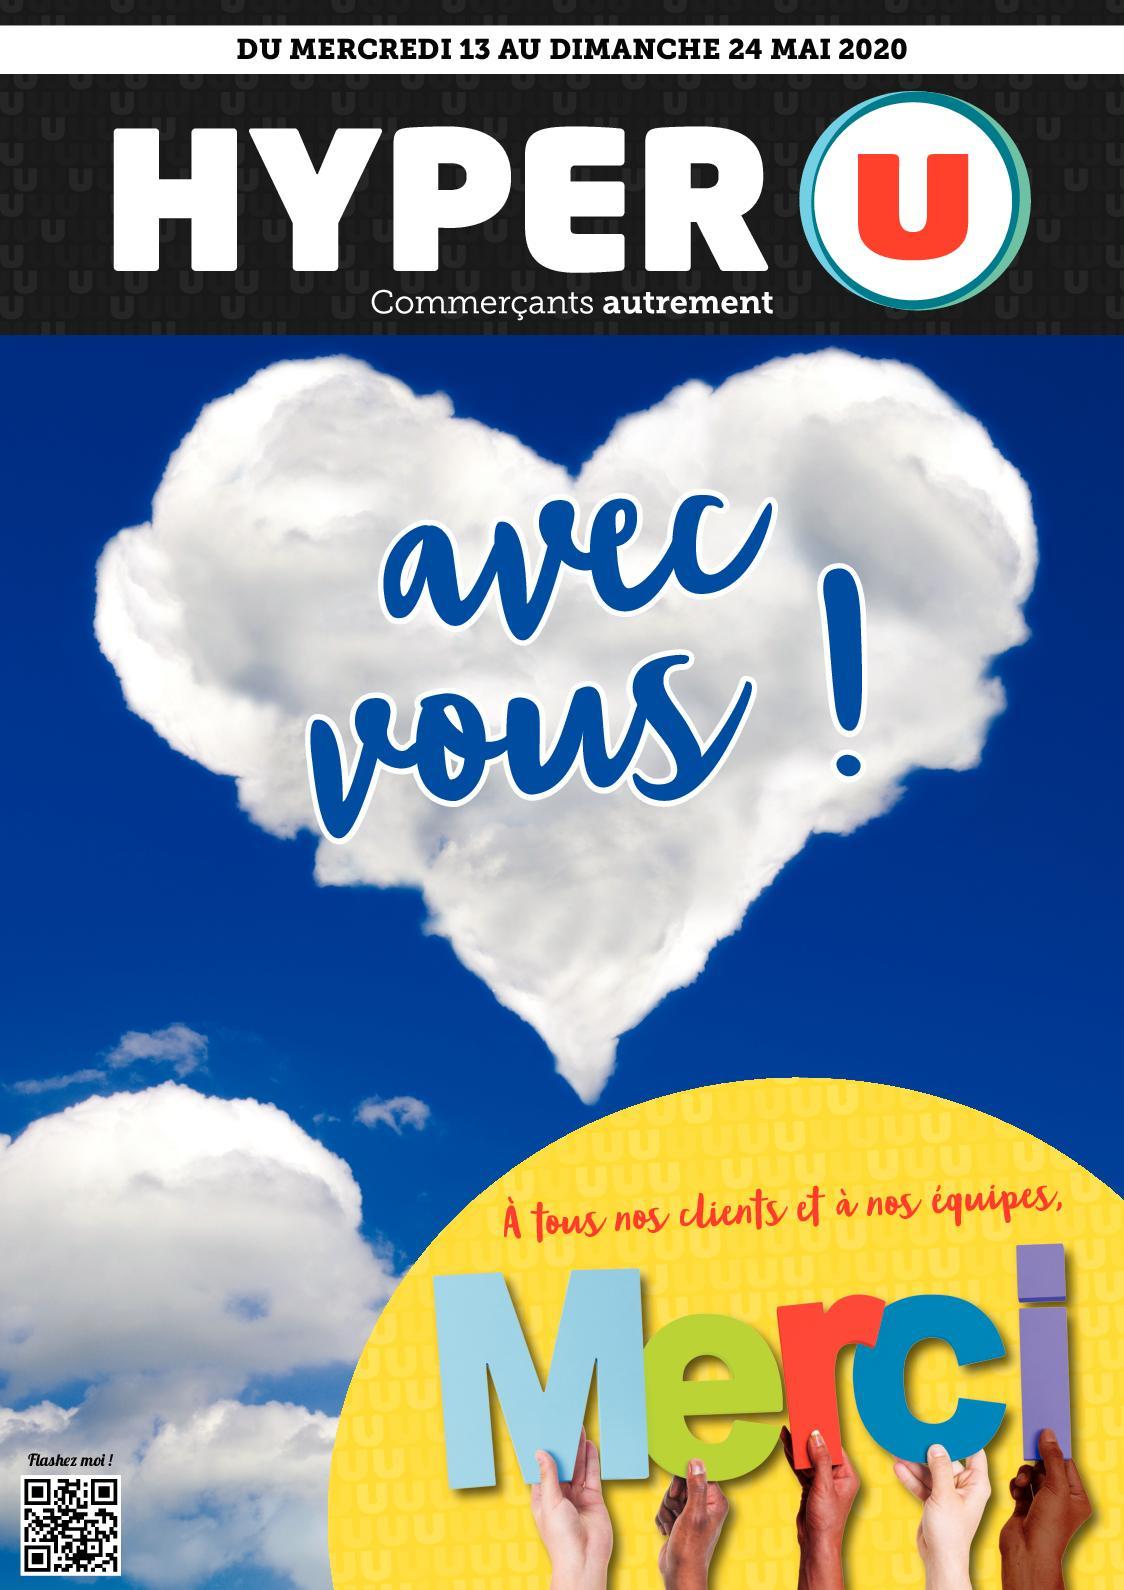 Calaméo - Catalogue Hyper U Martinique - Du Mercredi 13 Au ... destiné Abri De Jardin Hyper U